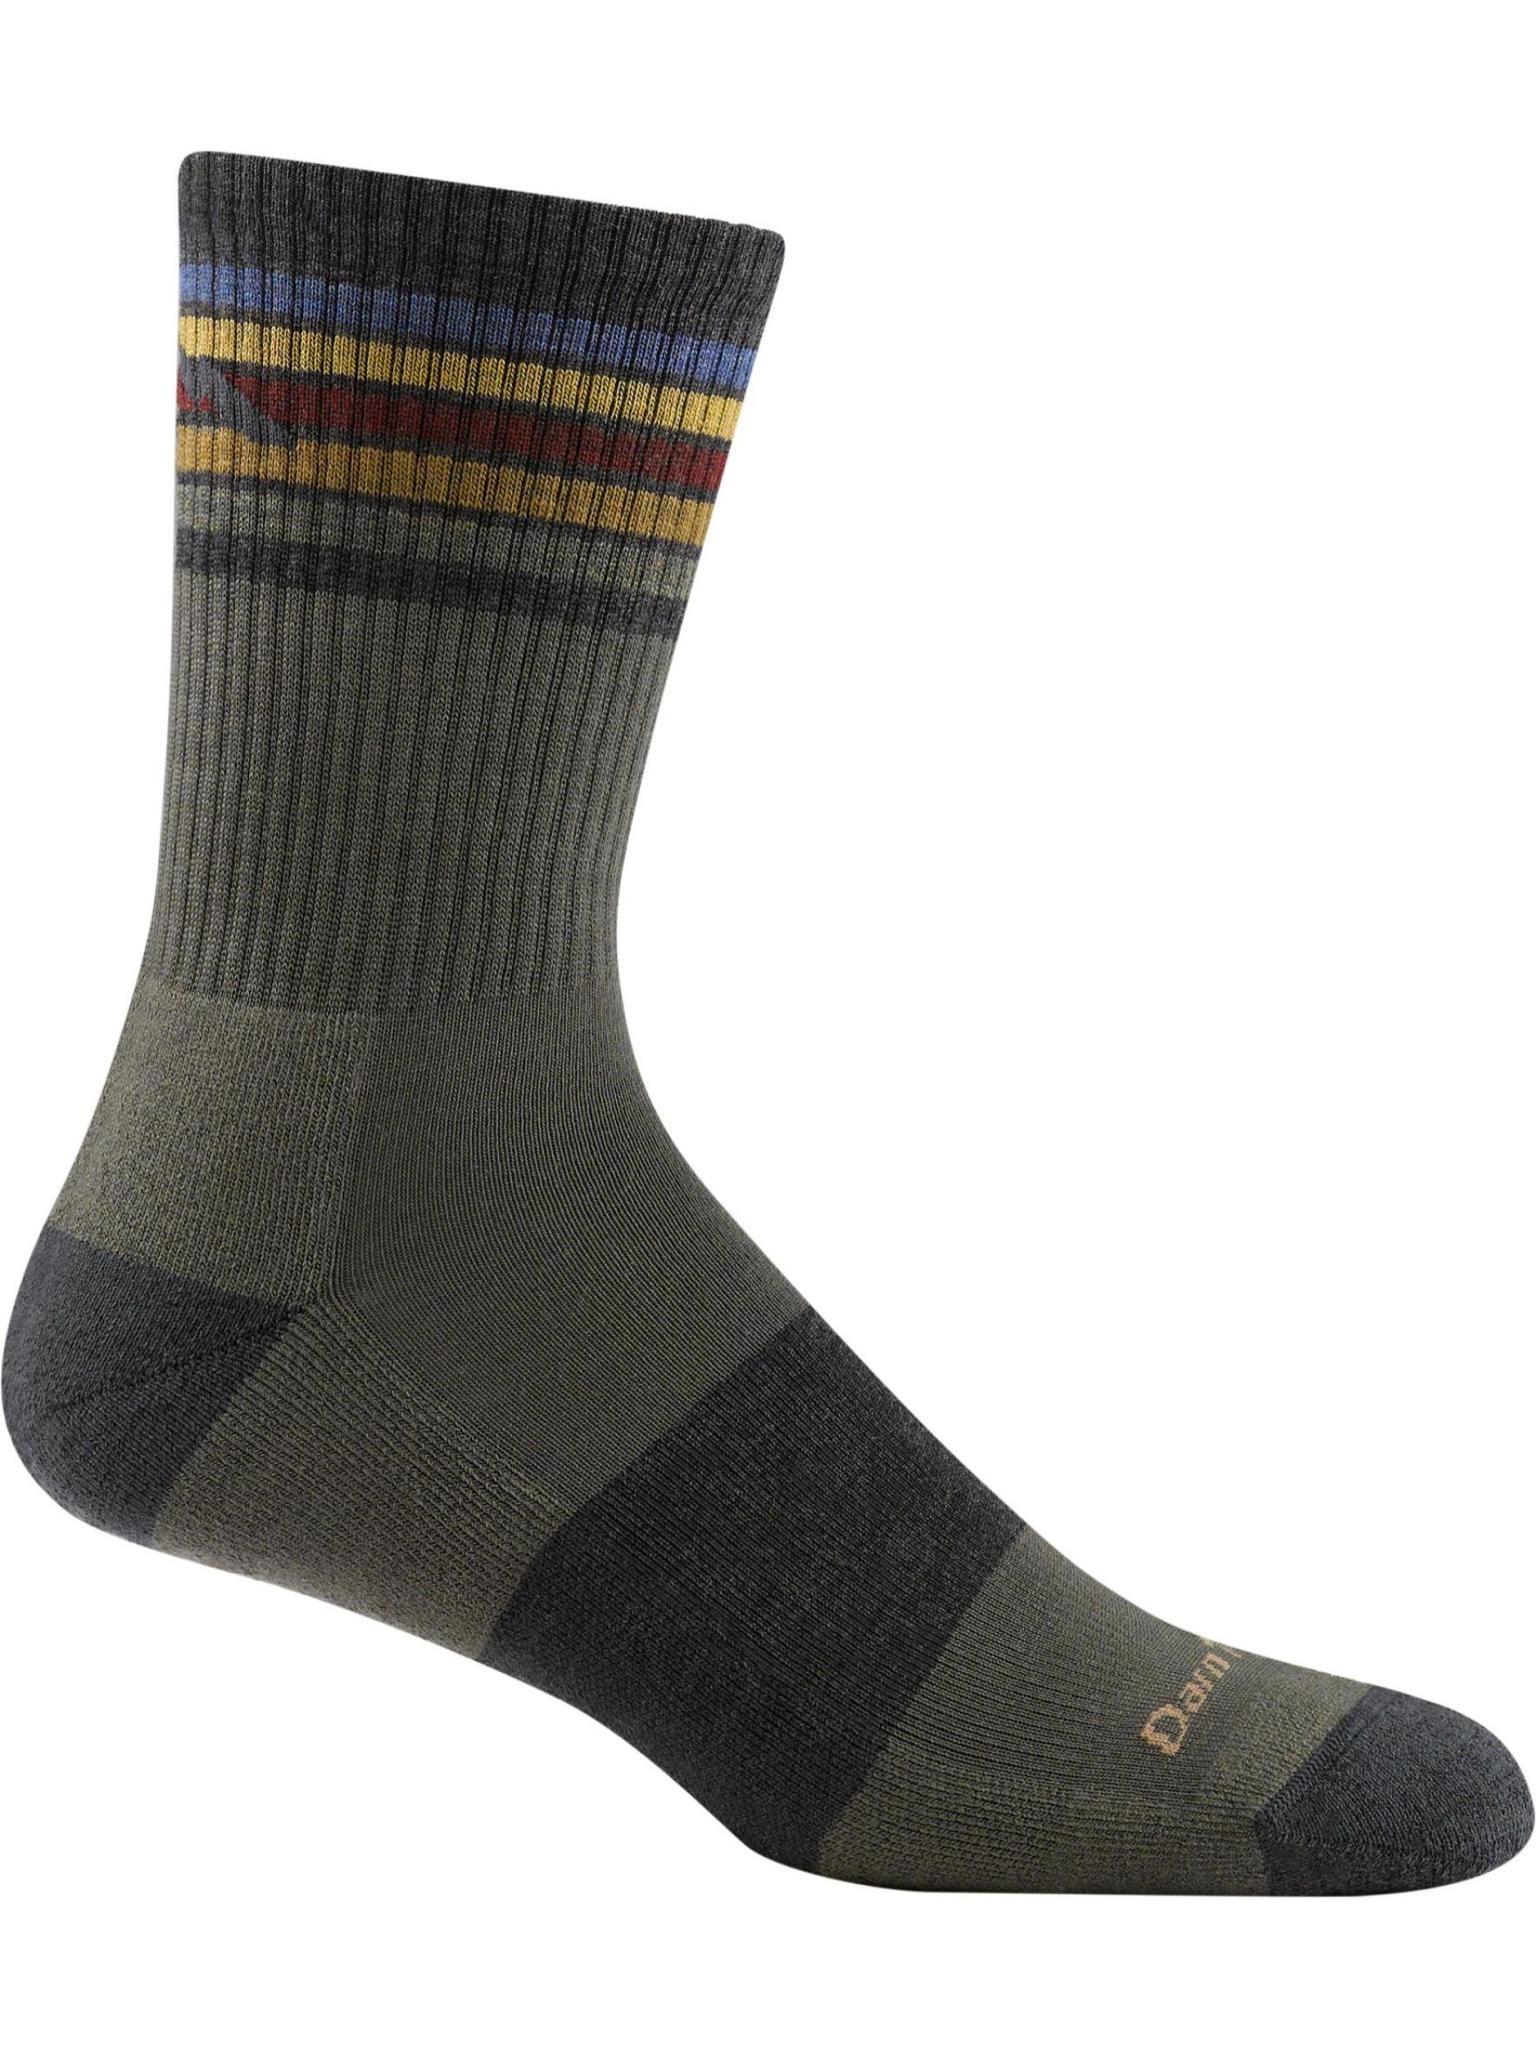 Darn Tough Men's Kelso Micro Crew Lightweight Hiking Sock